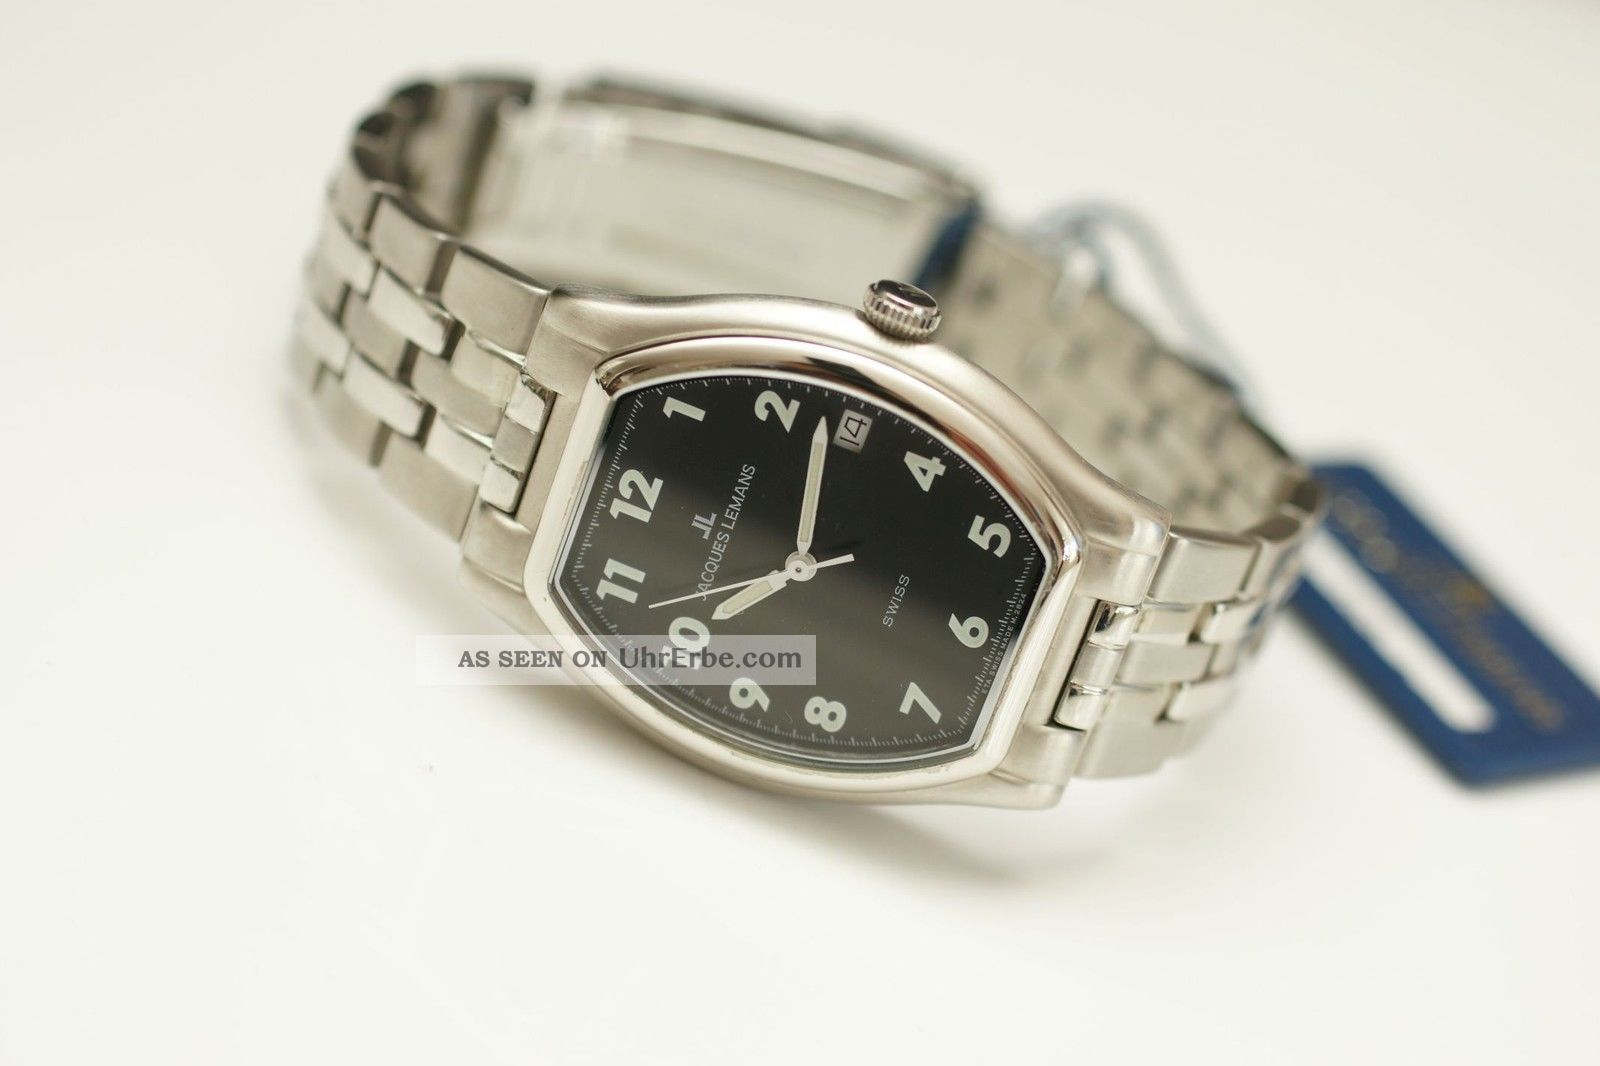 Jacques Lemans Hau Swiss Automatic Eta 2824 Ref: 1 - 750m182 Armbanduhren Bild